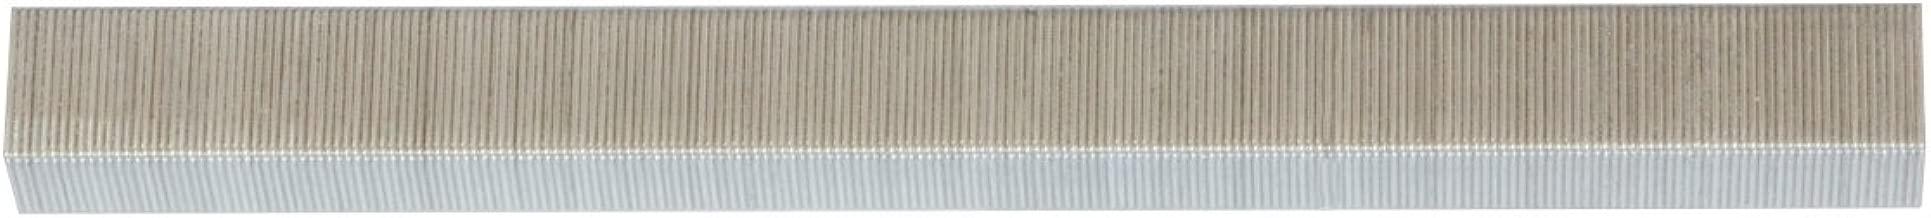 Standard Staples SP19 1/4 Length Free Office 5000pcs/pack (1)